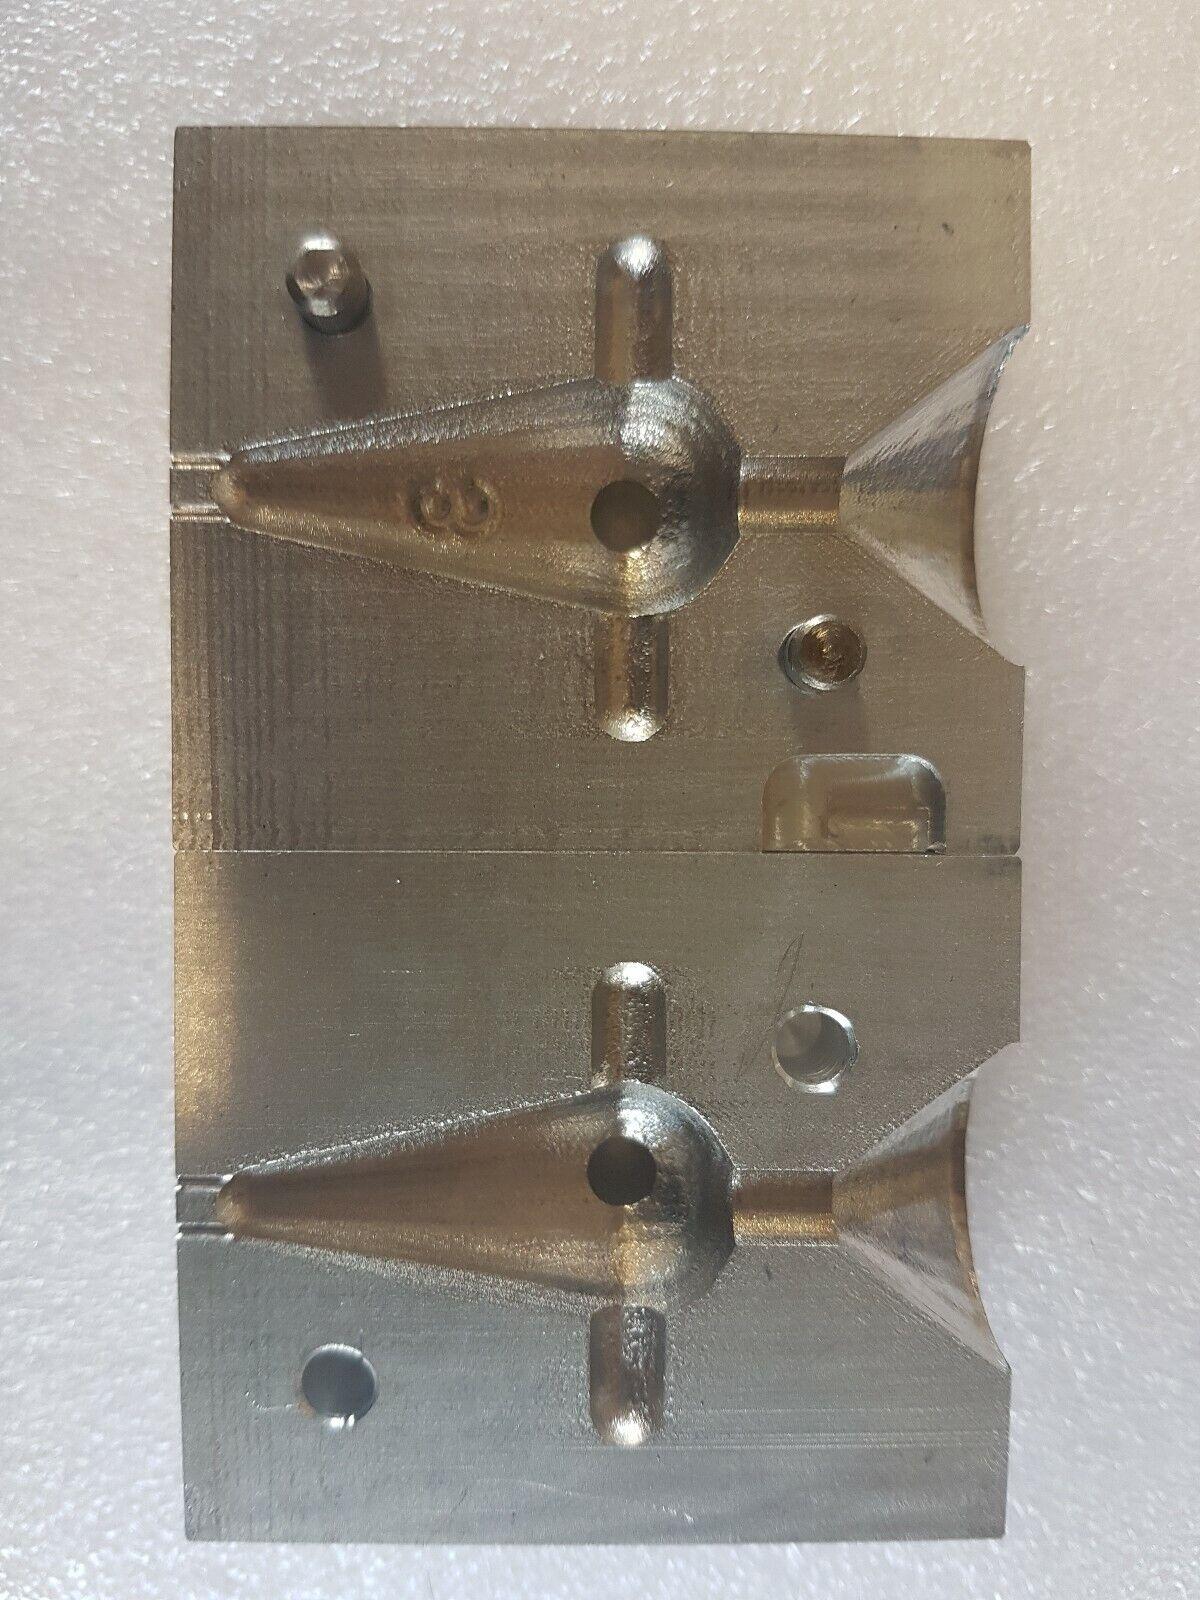 VISSERSERIJMARKER LOED MOLDEN 1X3OZ 1X4OZ CNC ALUMINIUM